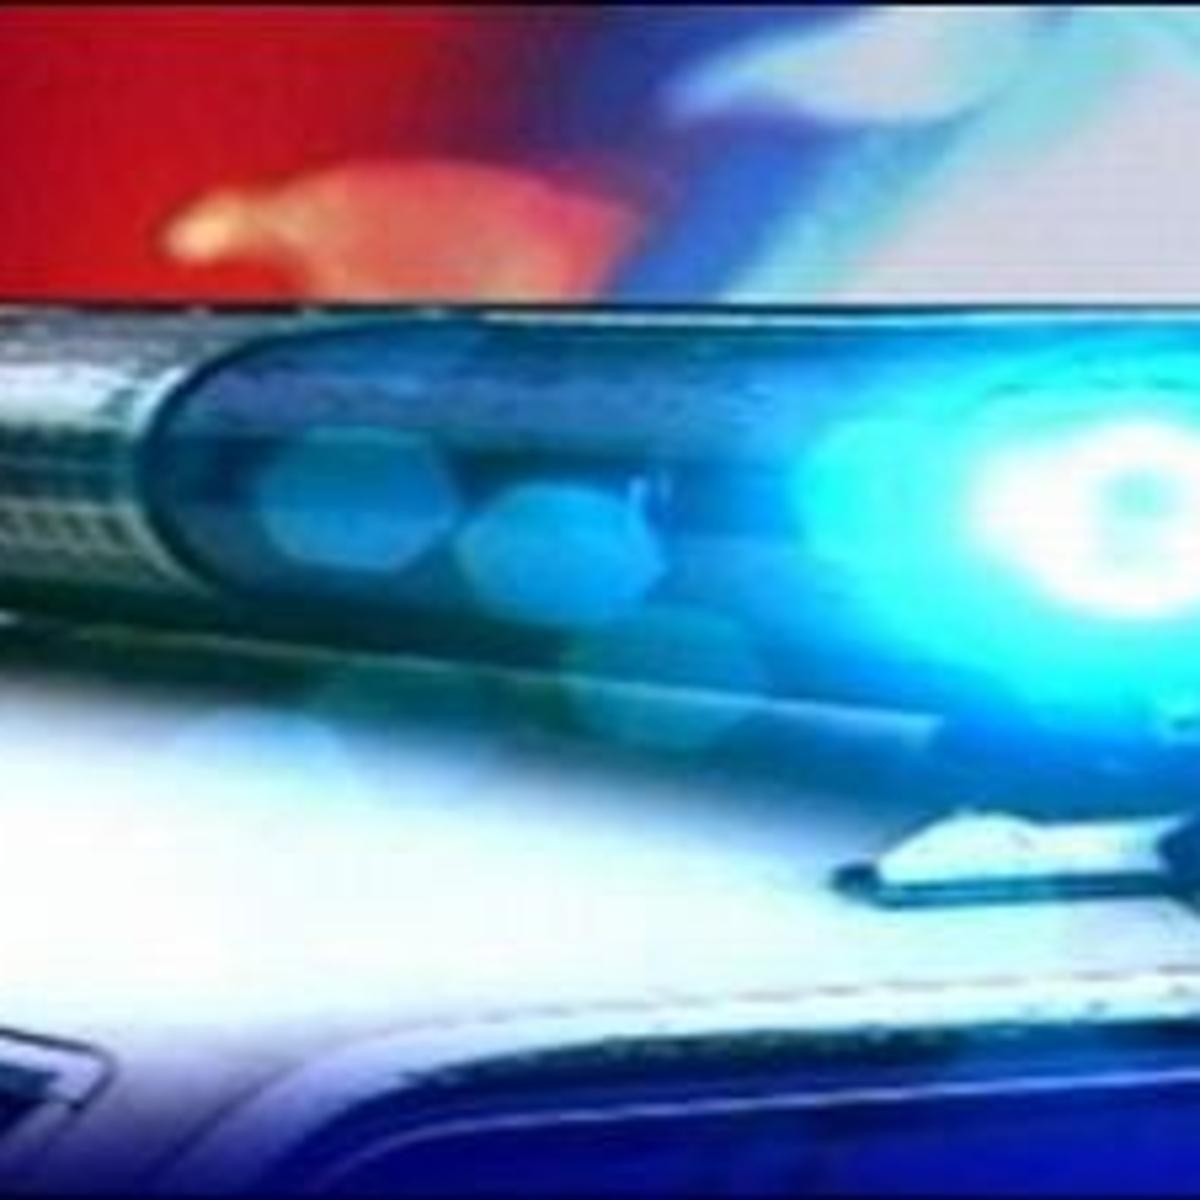 Search warrant: El Paso County boy stabbed mother in head